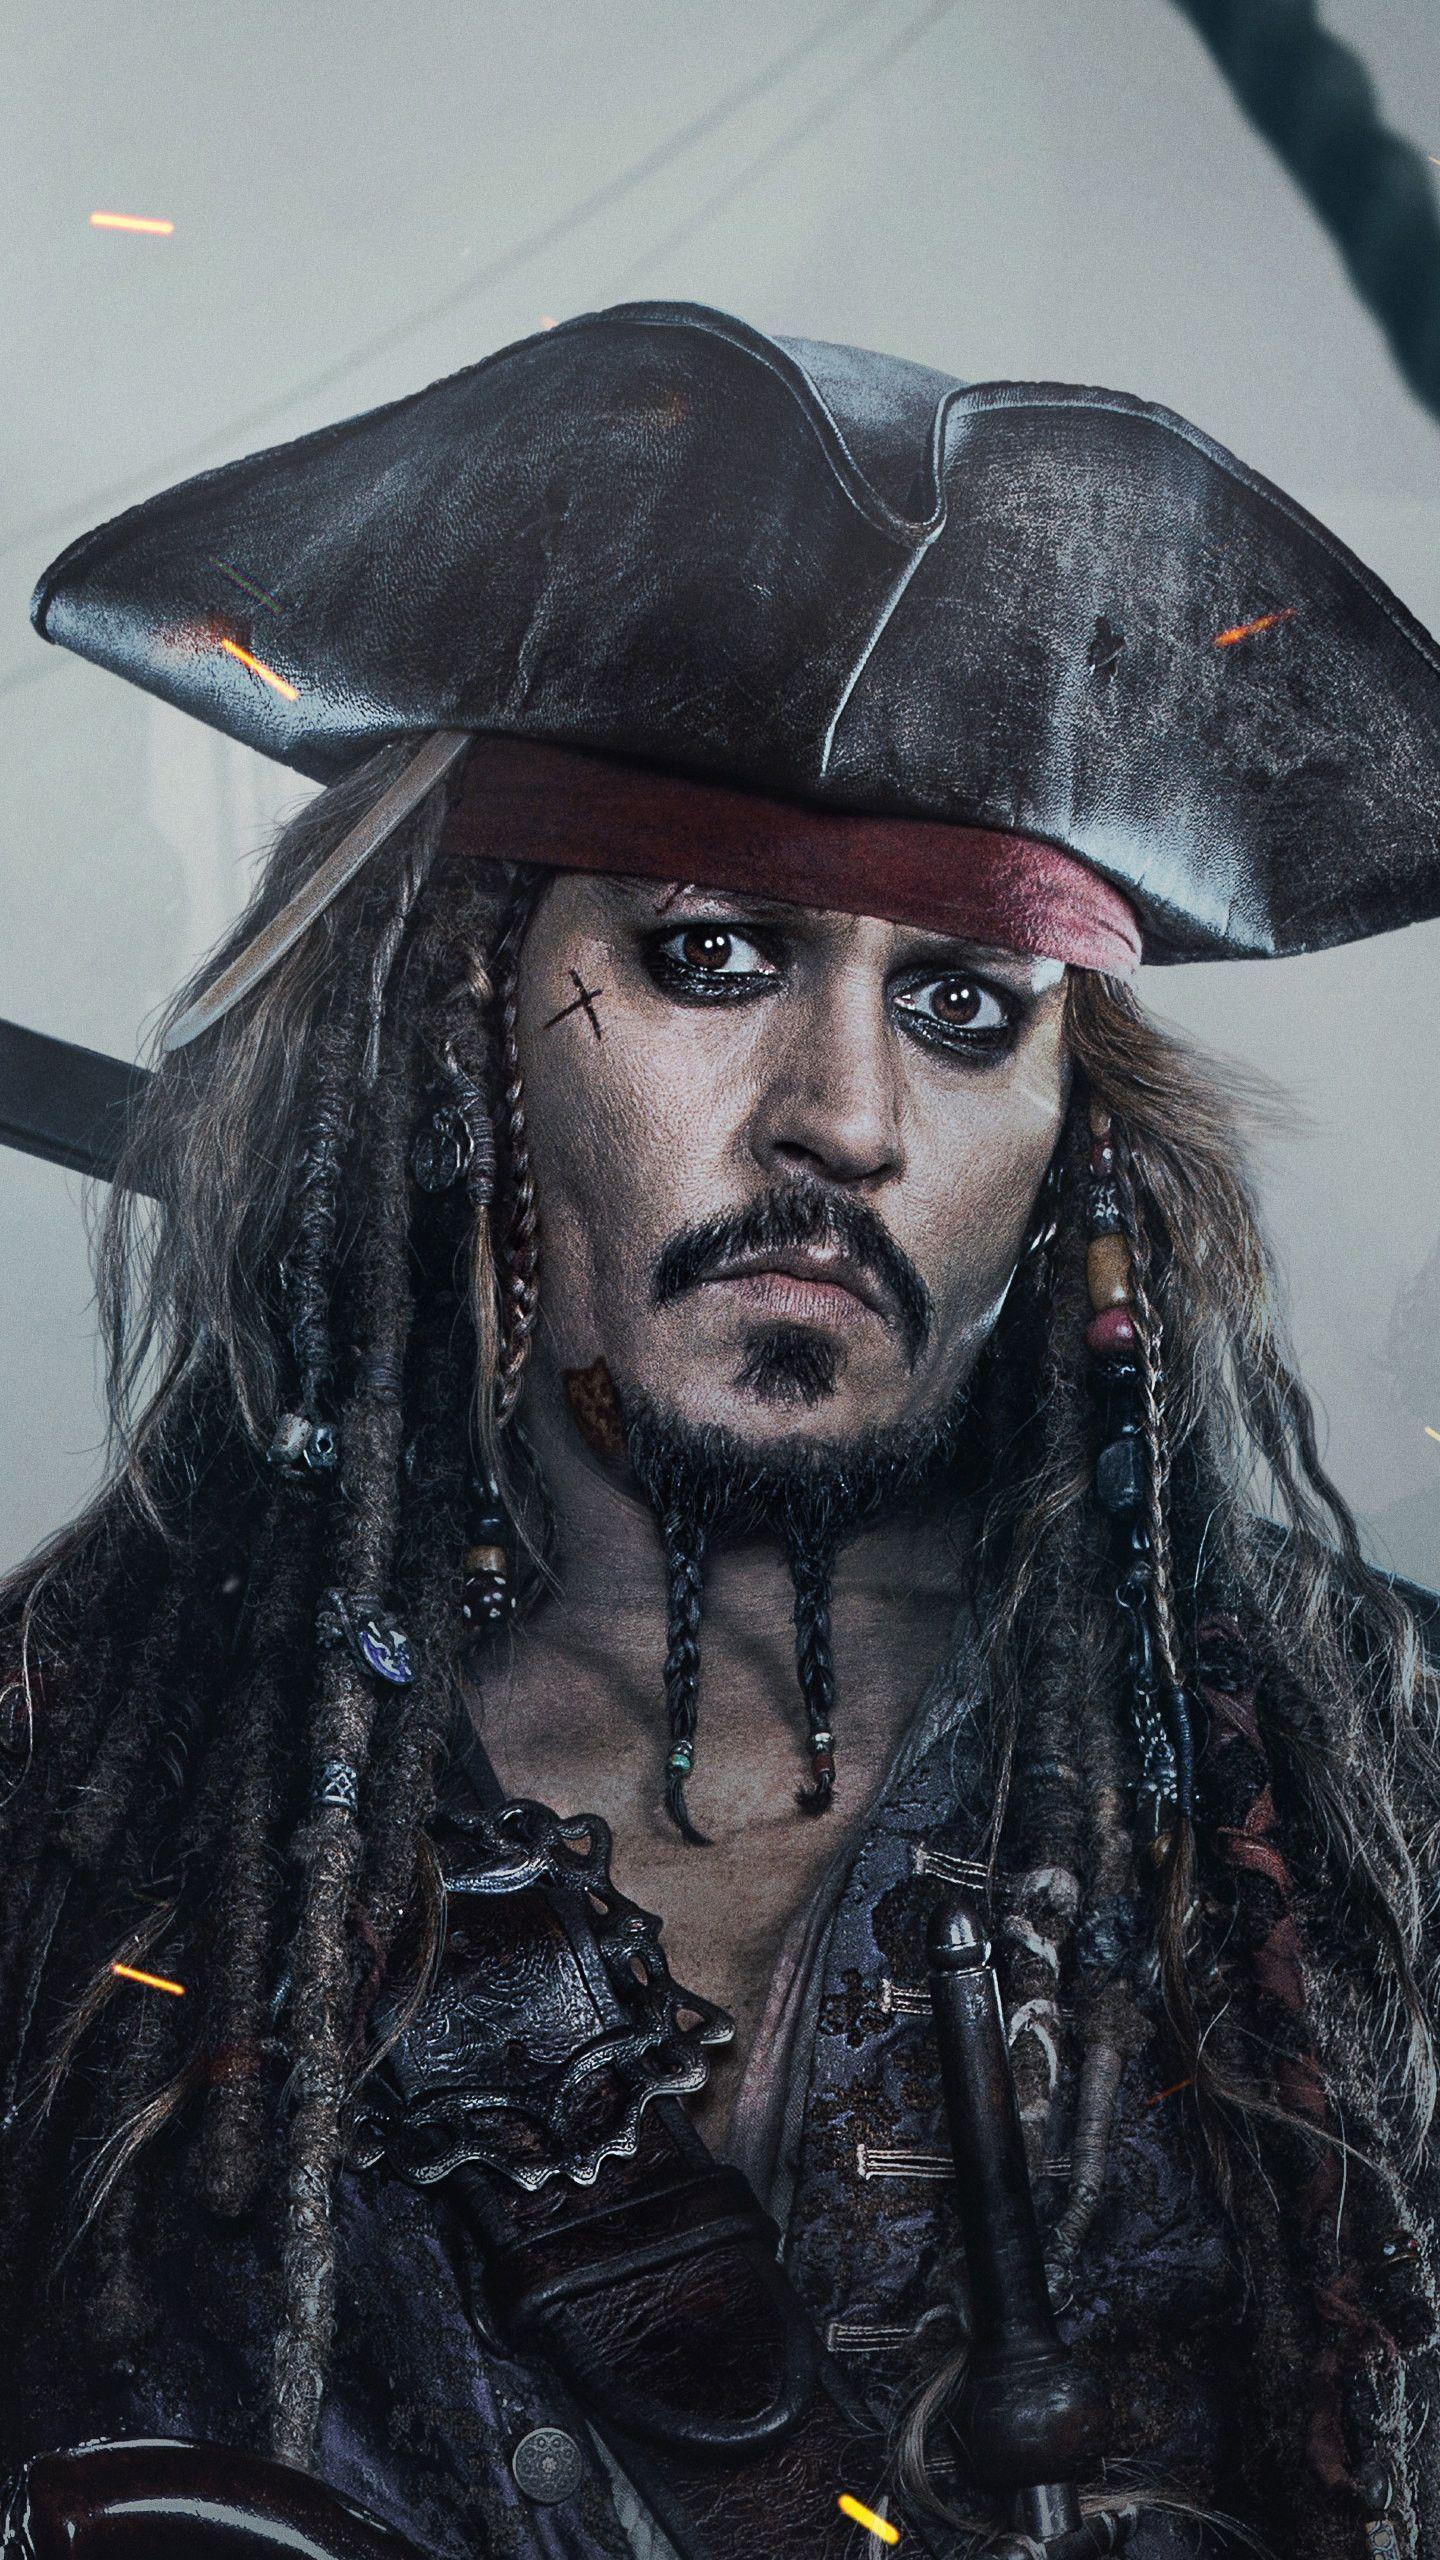 Captain Jack Sparrow Iphone Wallpapers Top Free Captain